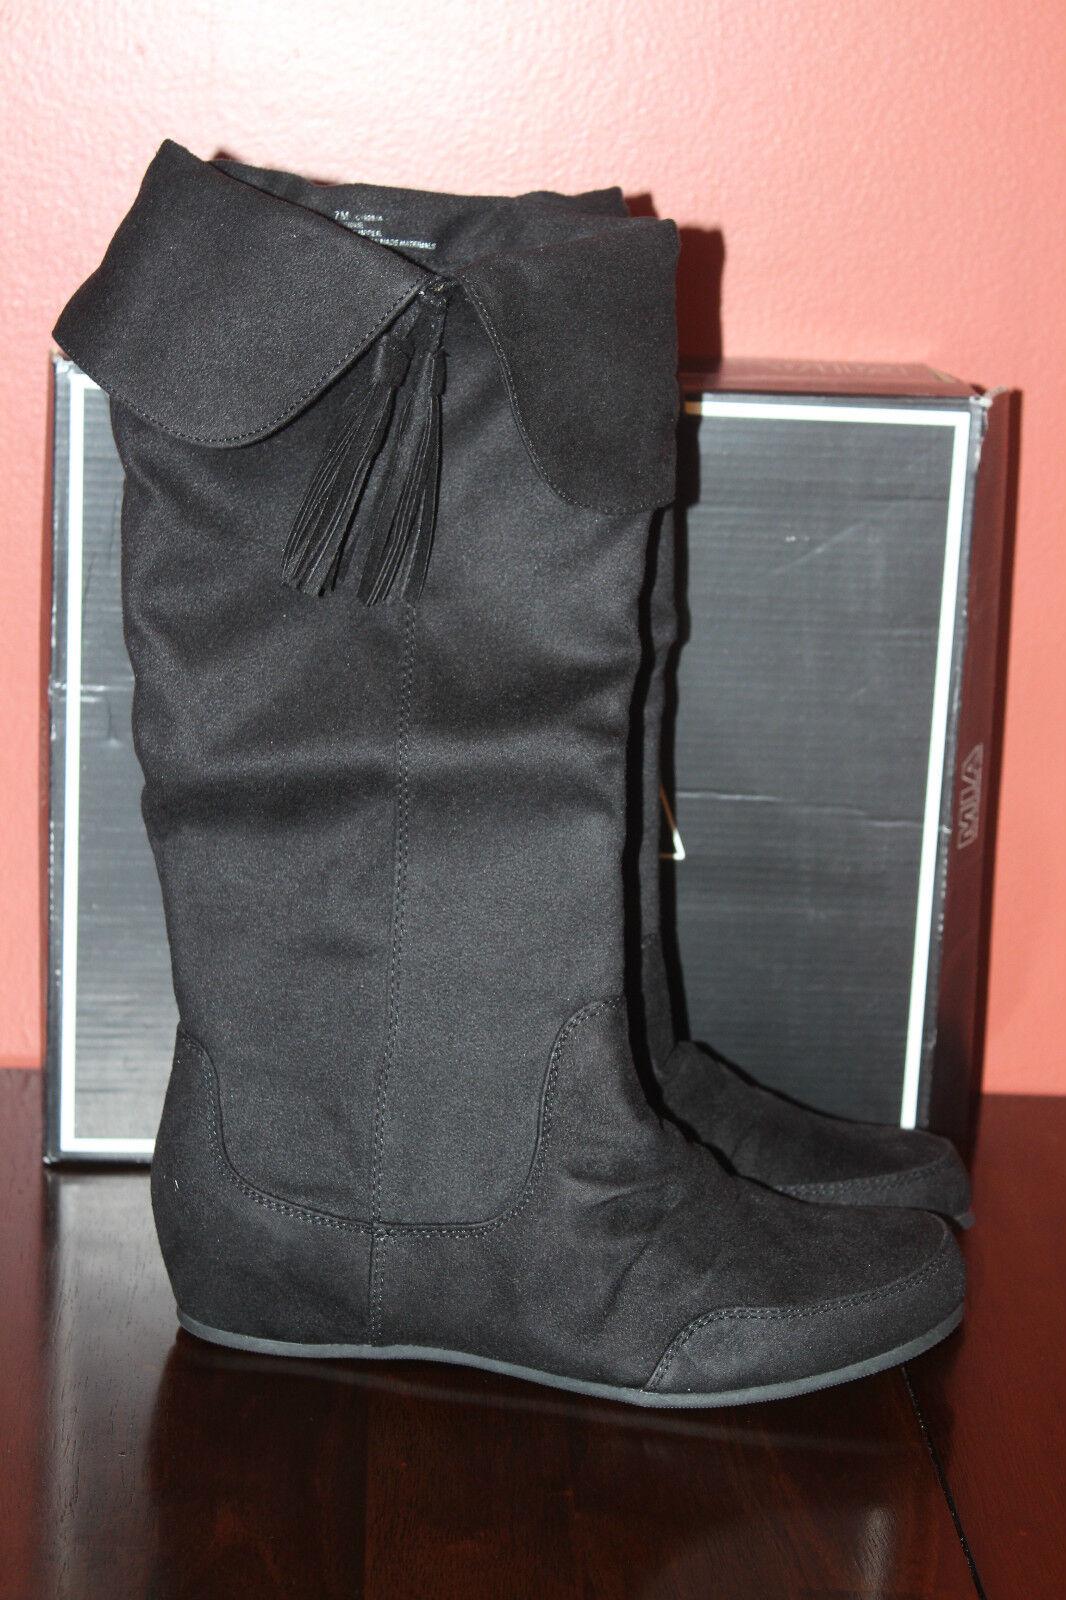 MIA CHERRIE TASSEL BOOT BLACK SUEDE    7us  80 80f3f7